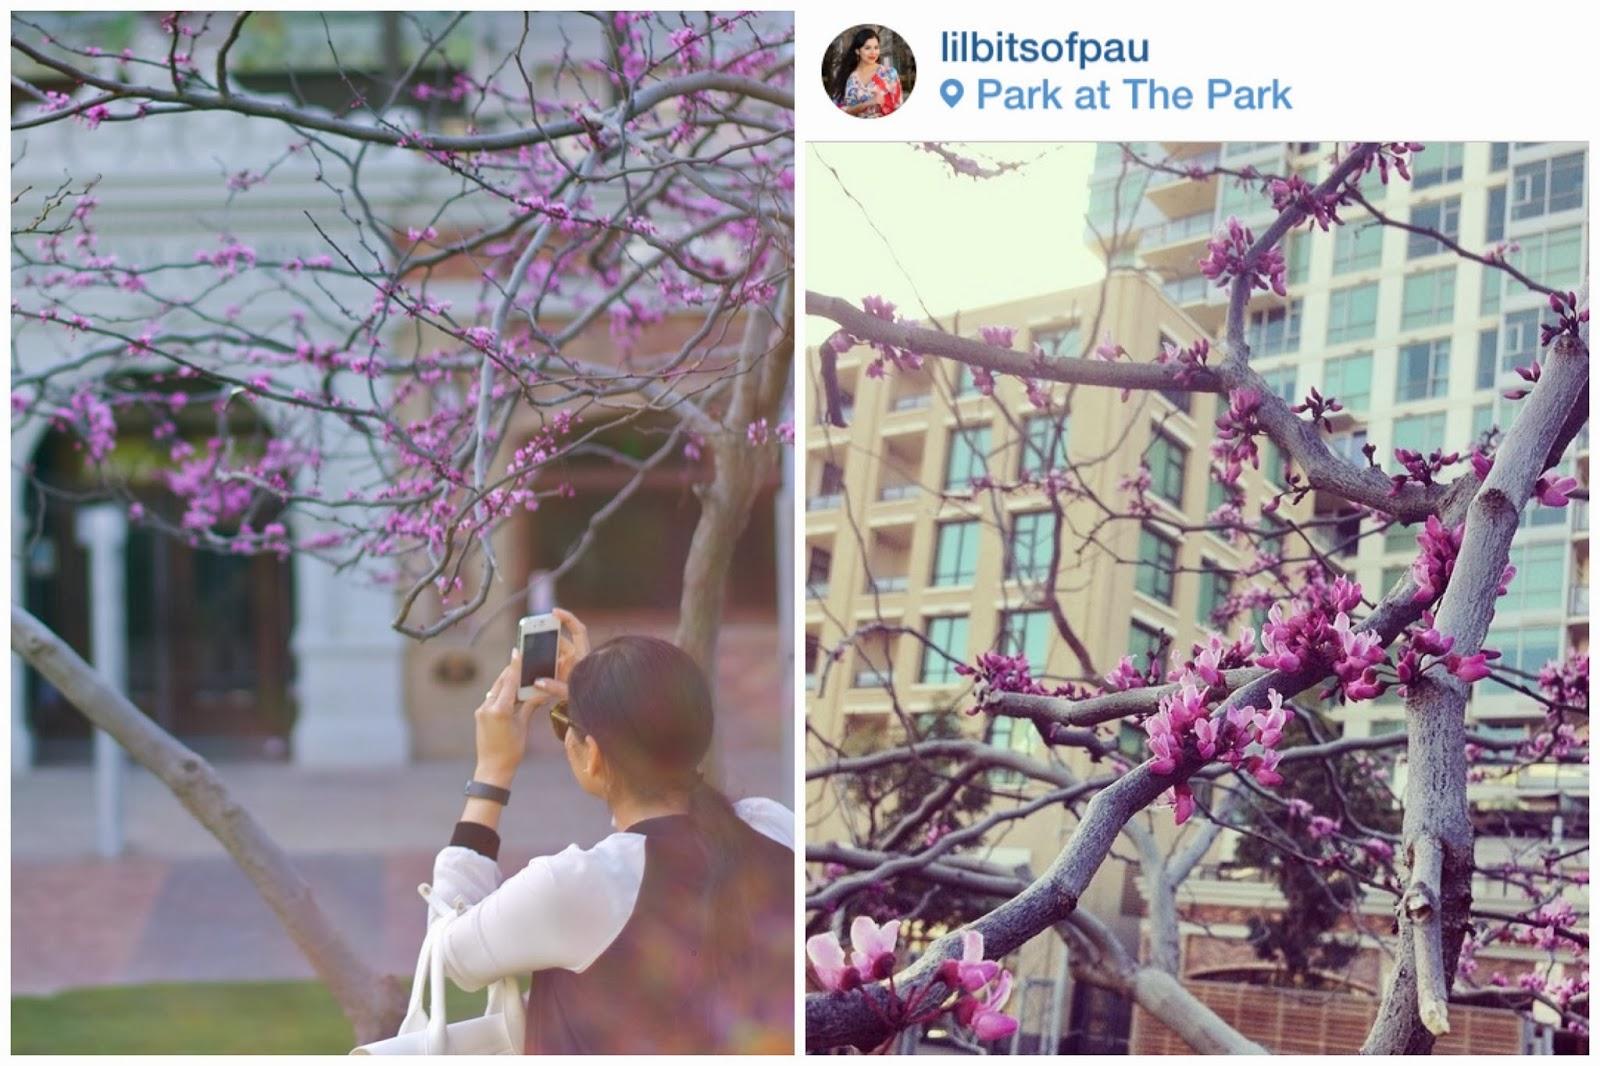 lilbitsofpau instagram, bts instagram lilbitsofpau, @lilbitsofpau